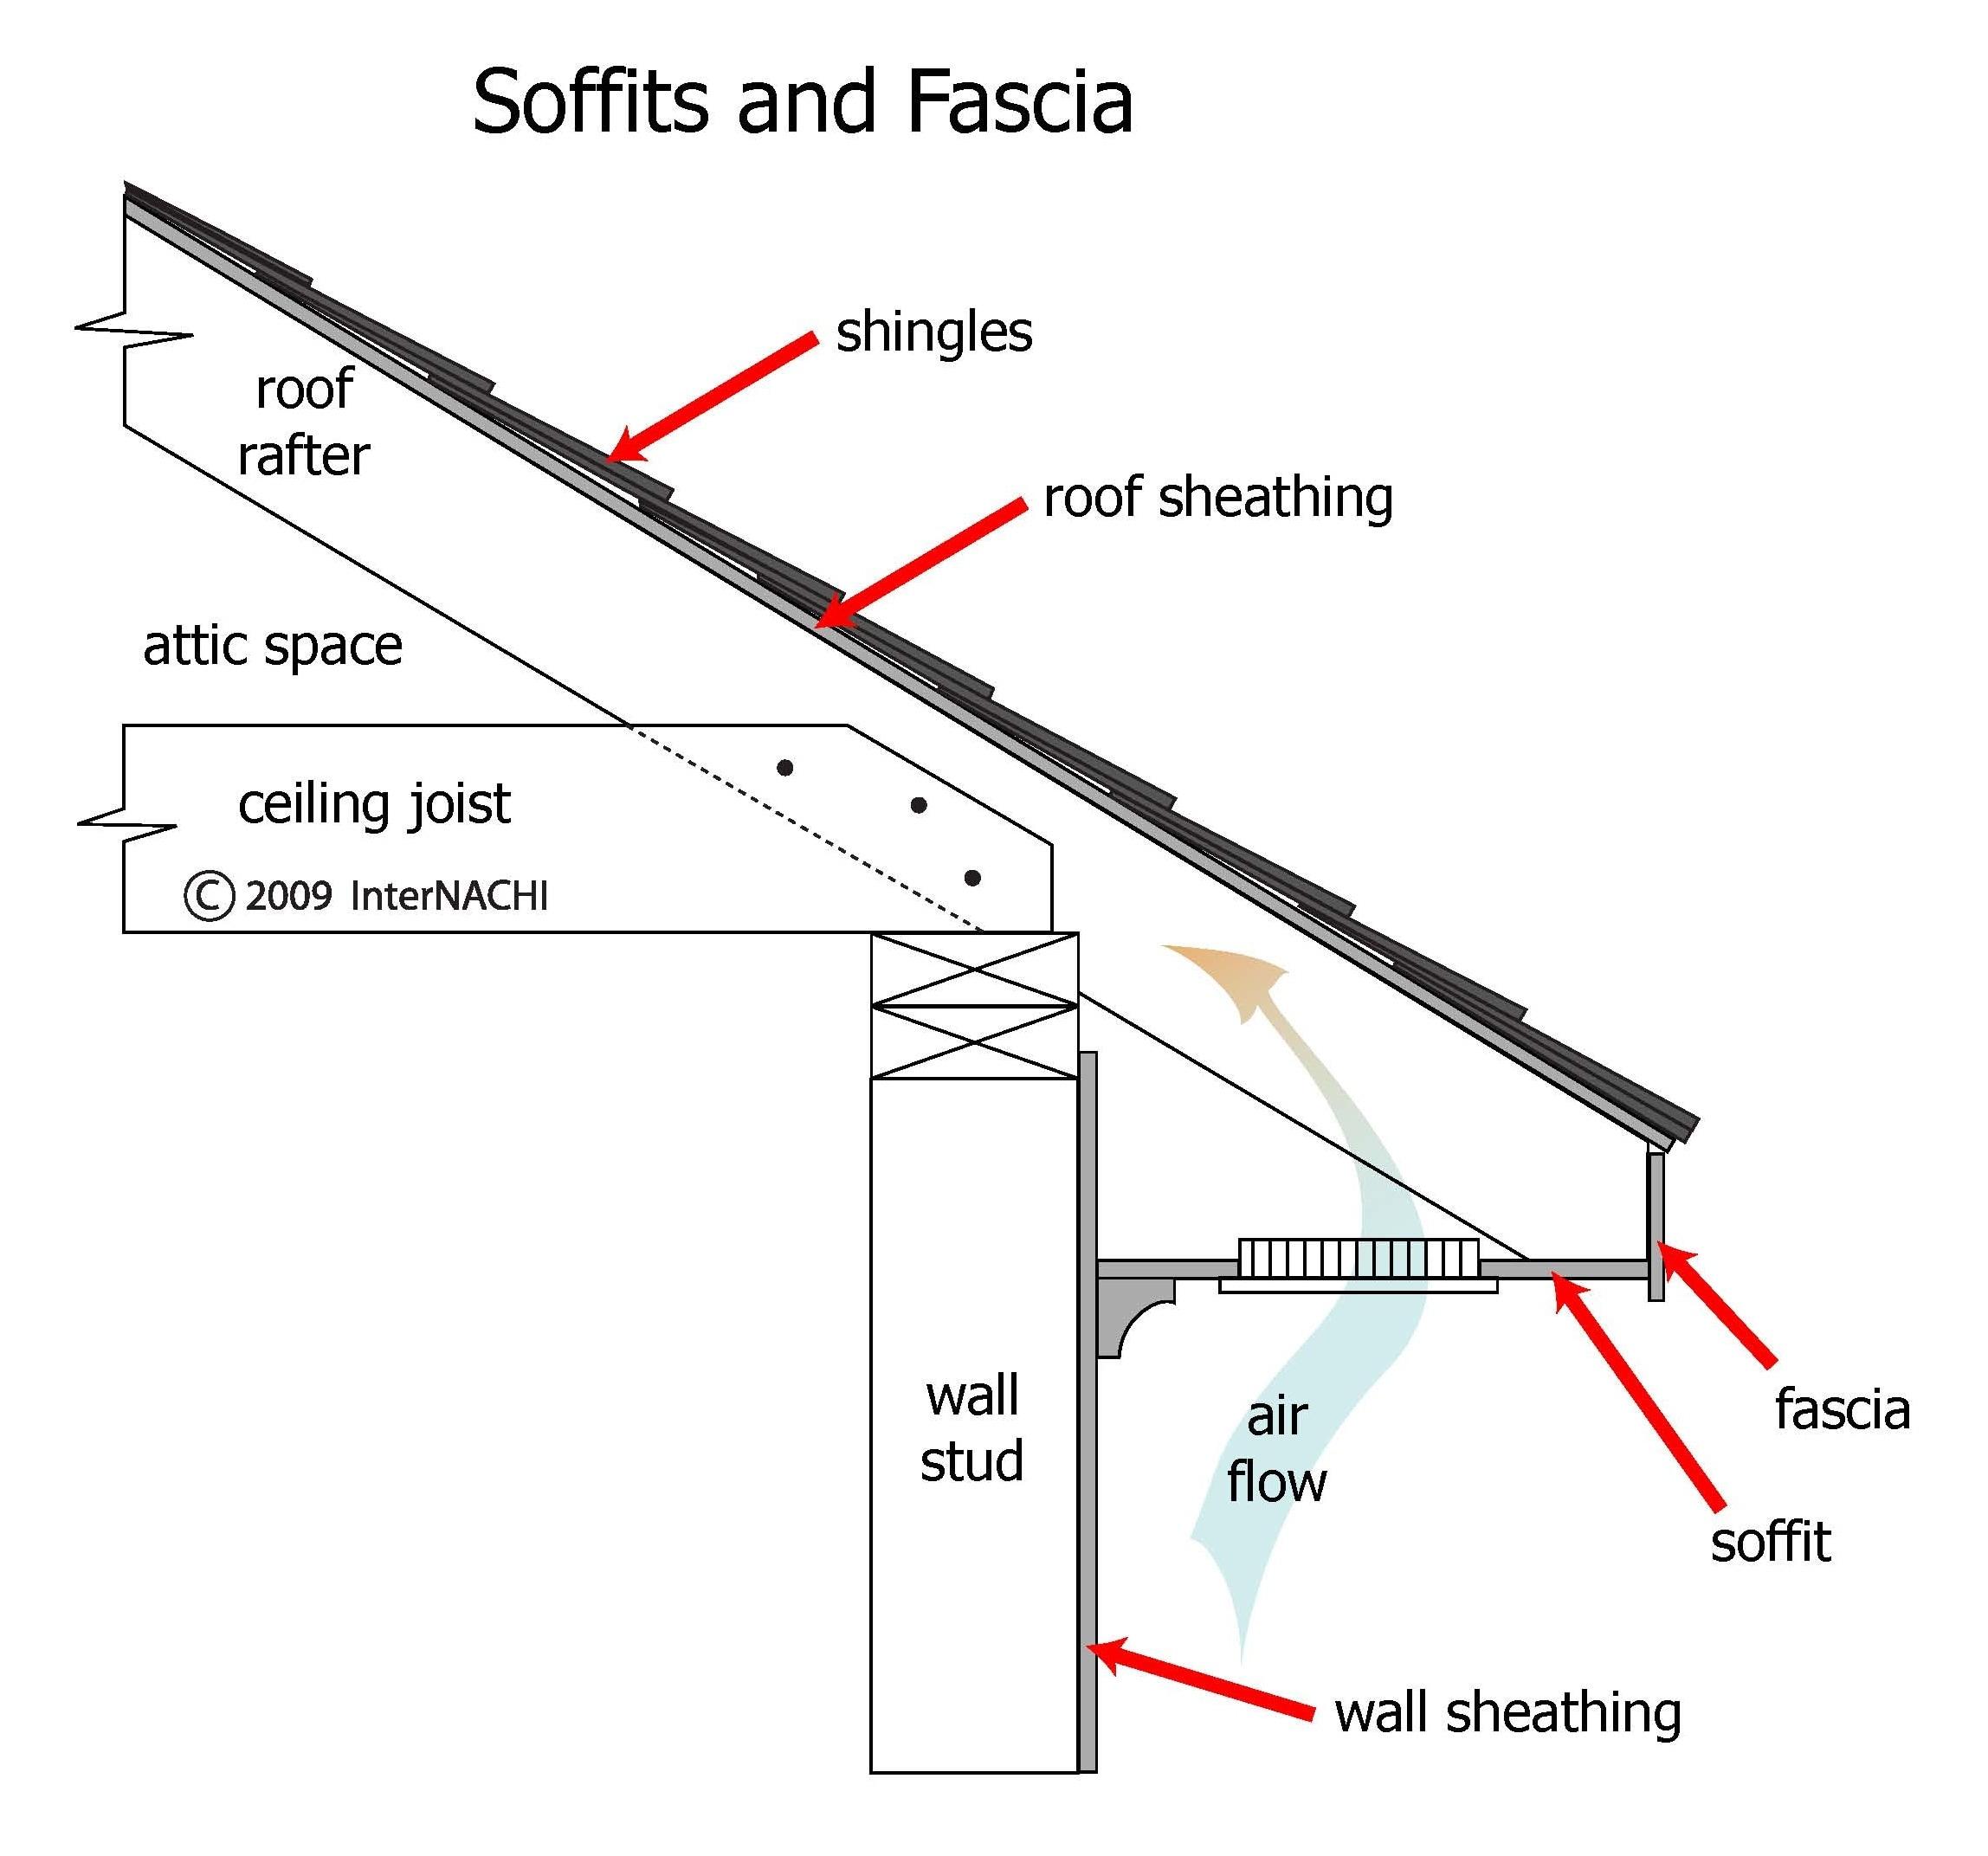 Soffits and fascia.